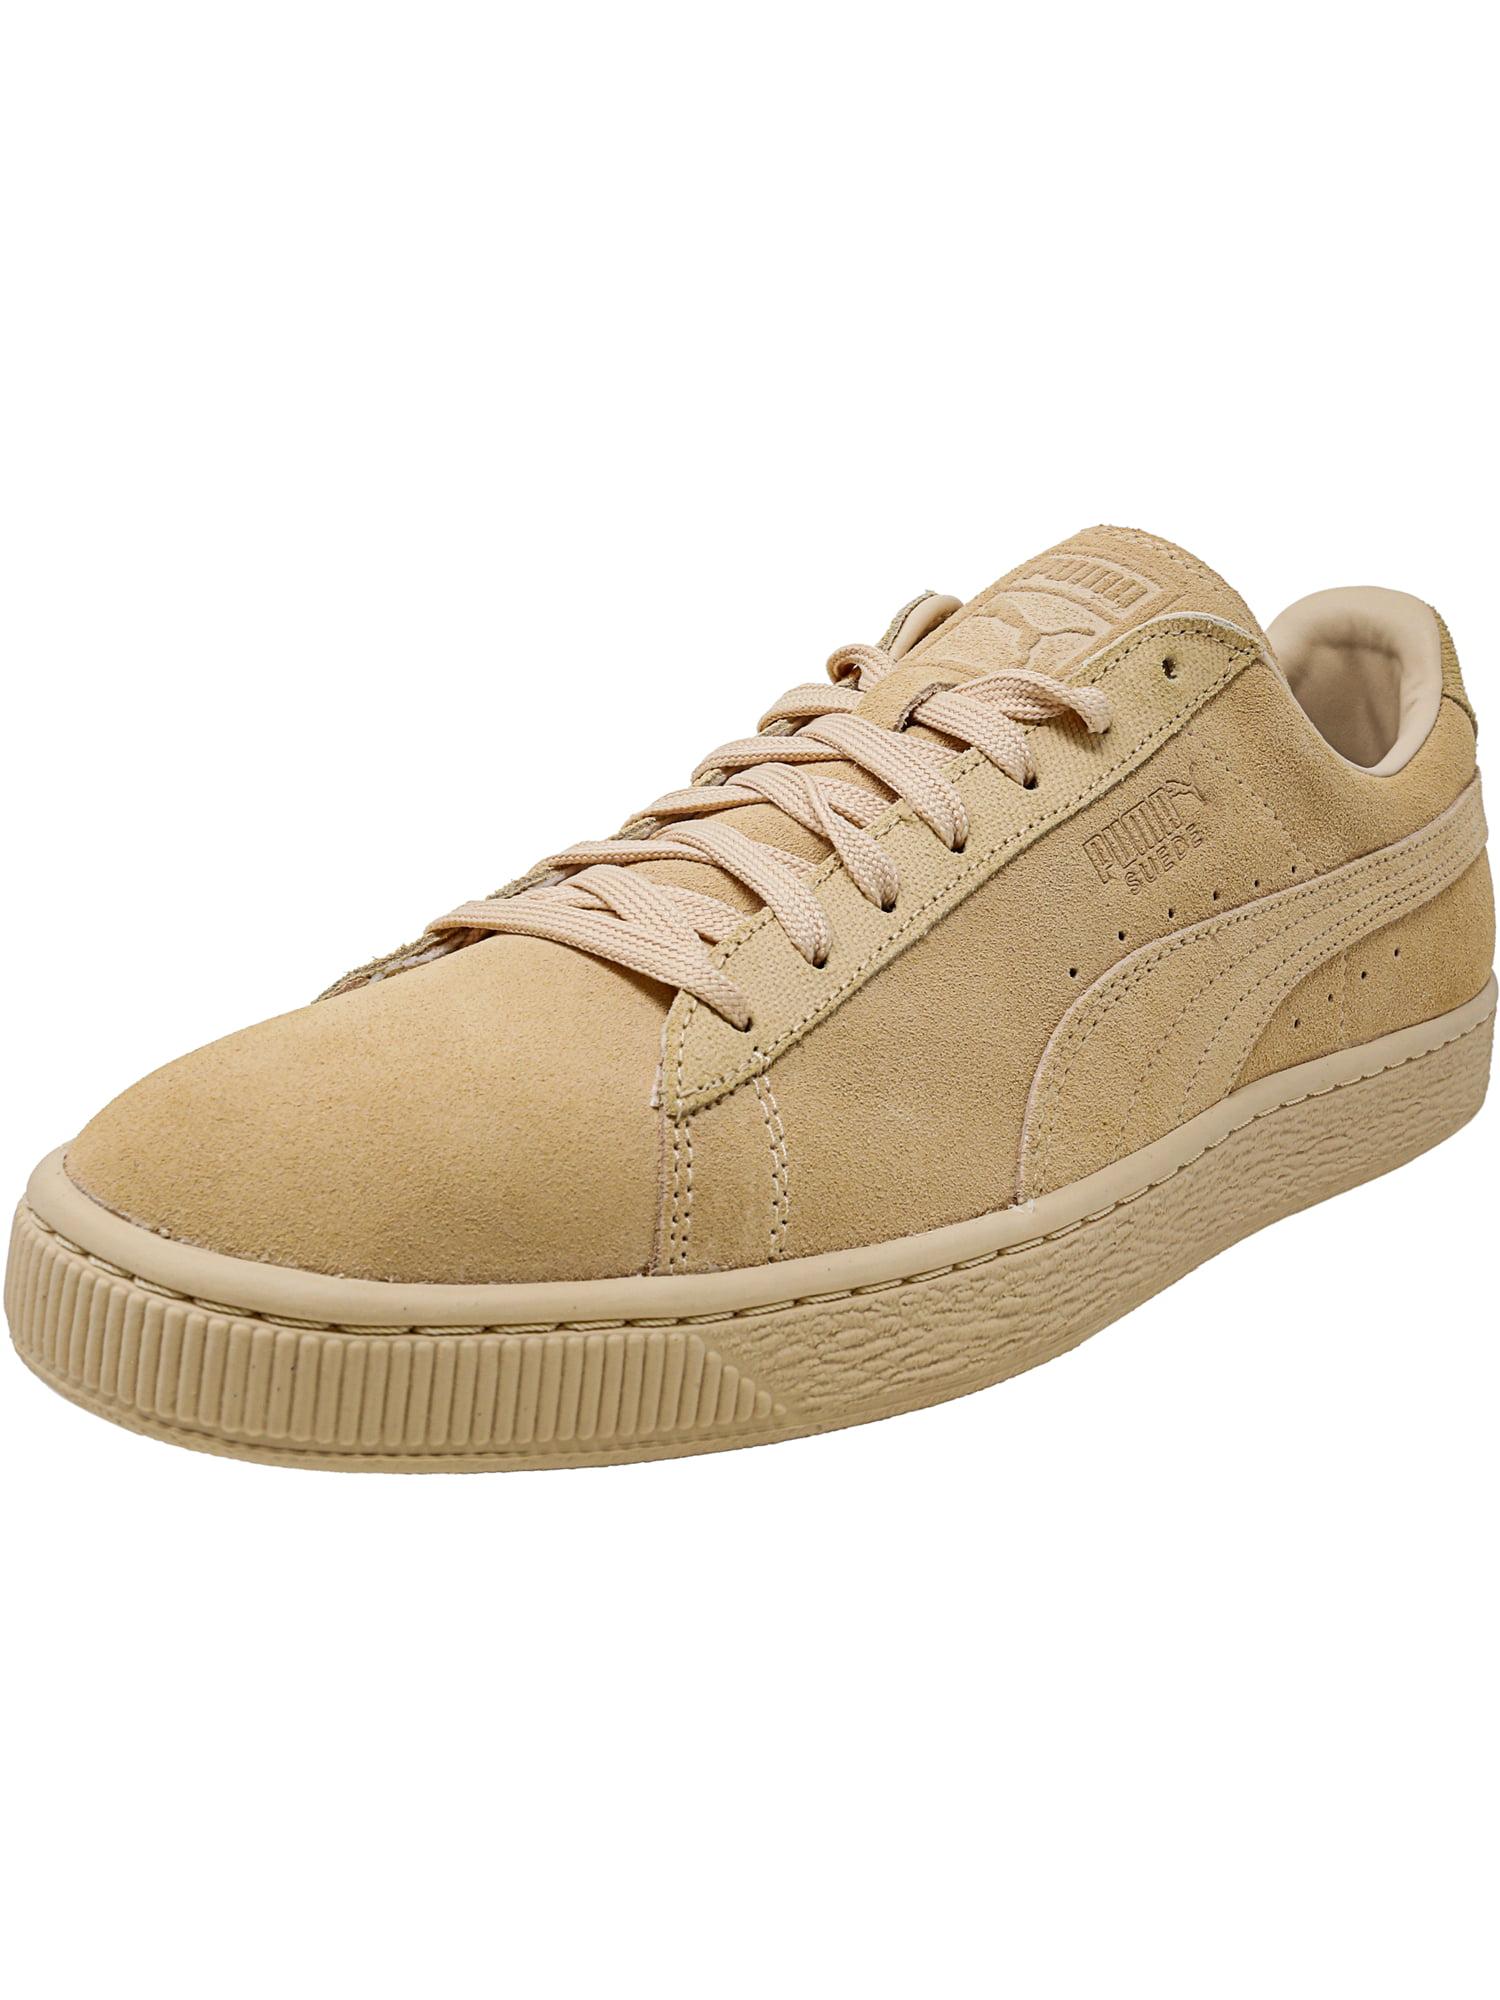 the best attitude 6e89a 093af Puma Men's Classic Tonal Suede Natural Vachetta Ankle-High Fashion Sneaker  - 10M